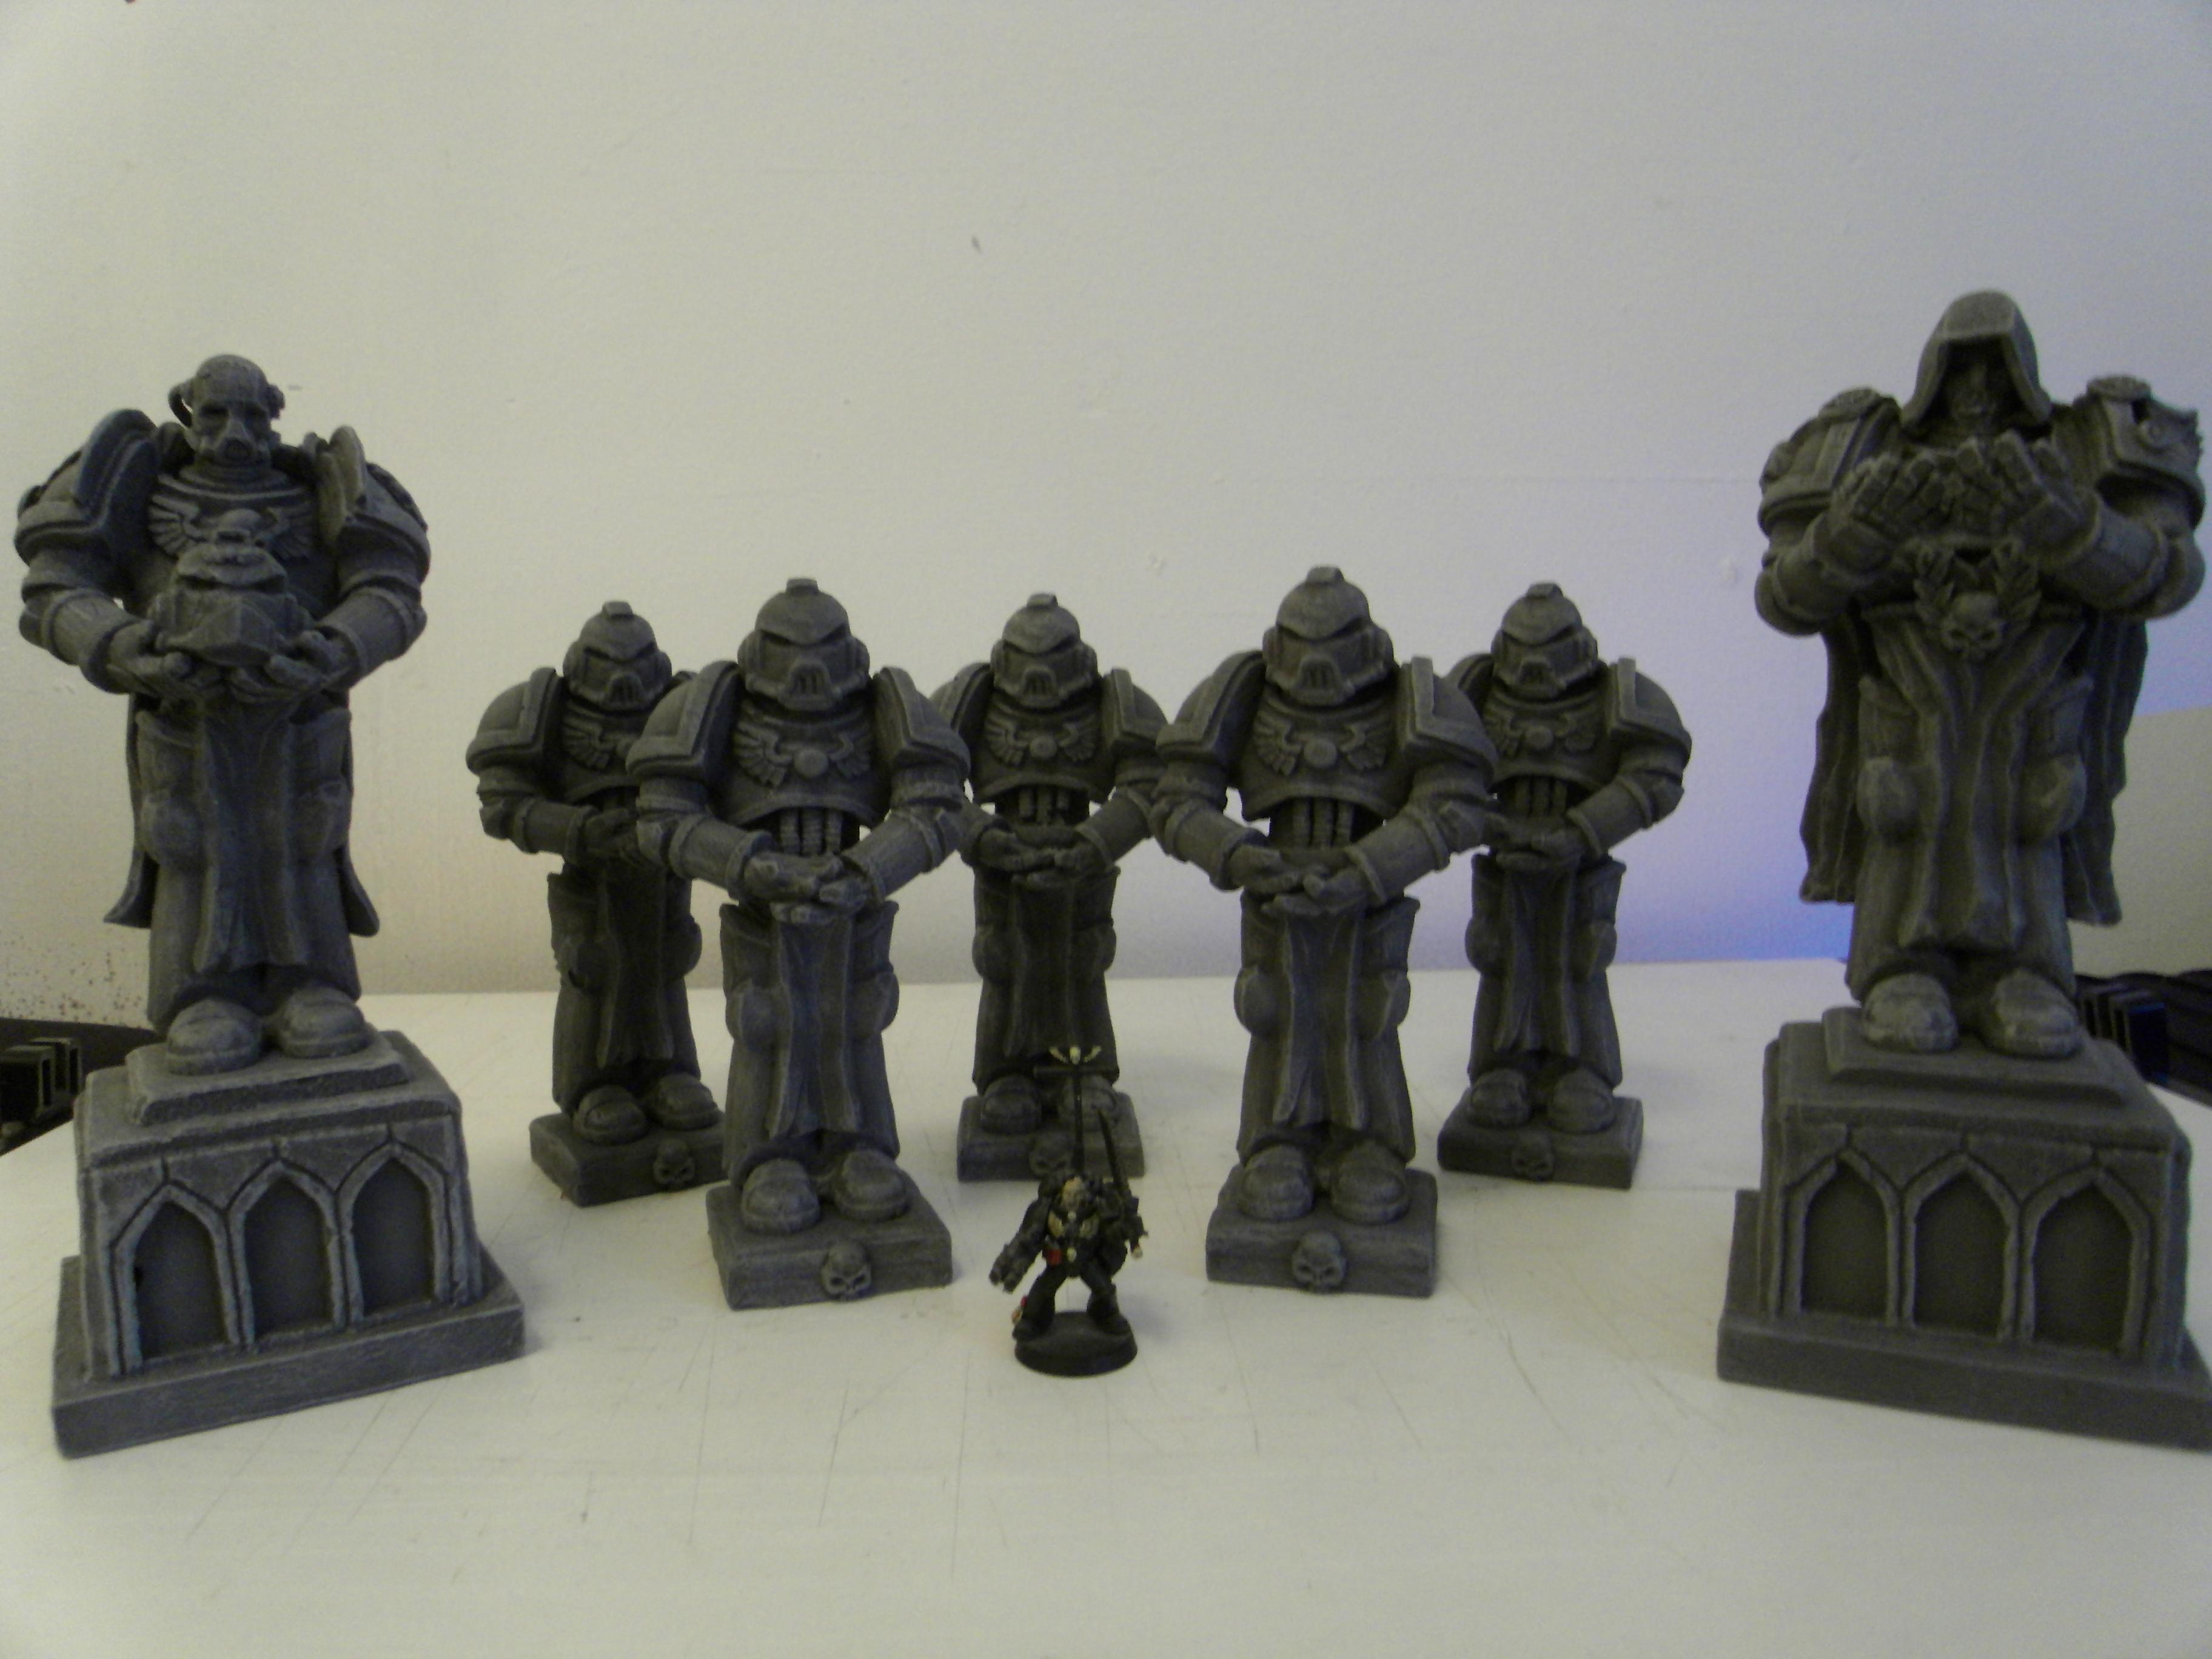 Adeptus Astartes, Space Marines, Statues, Warhammer 40,000